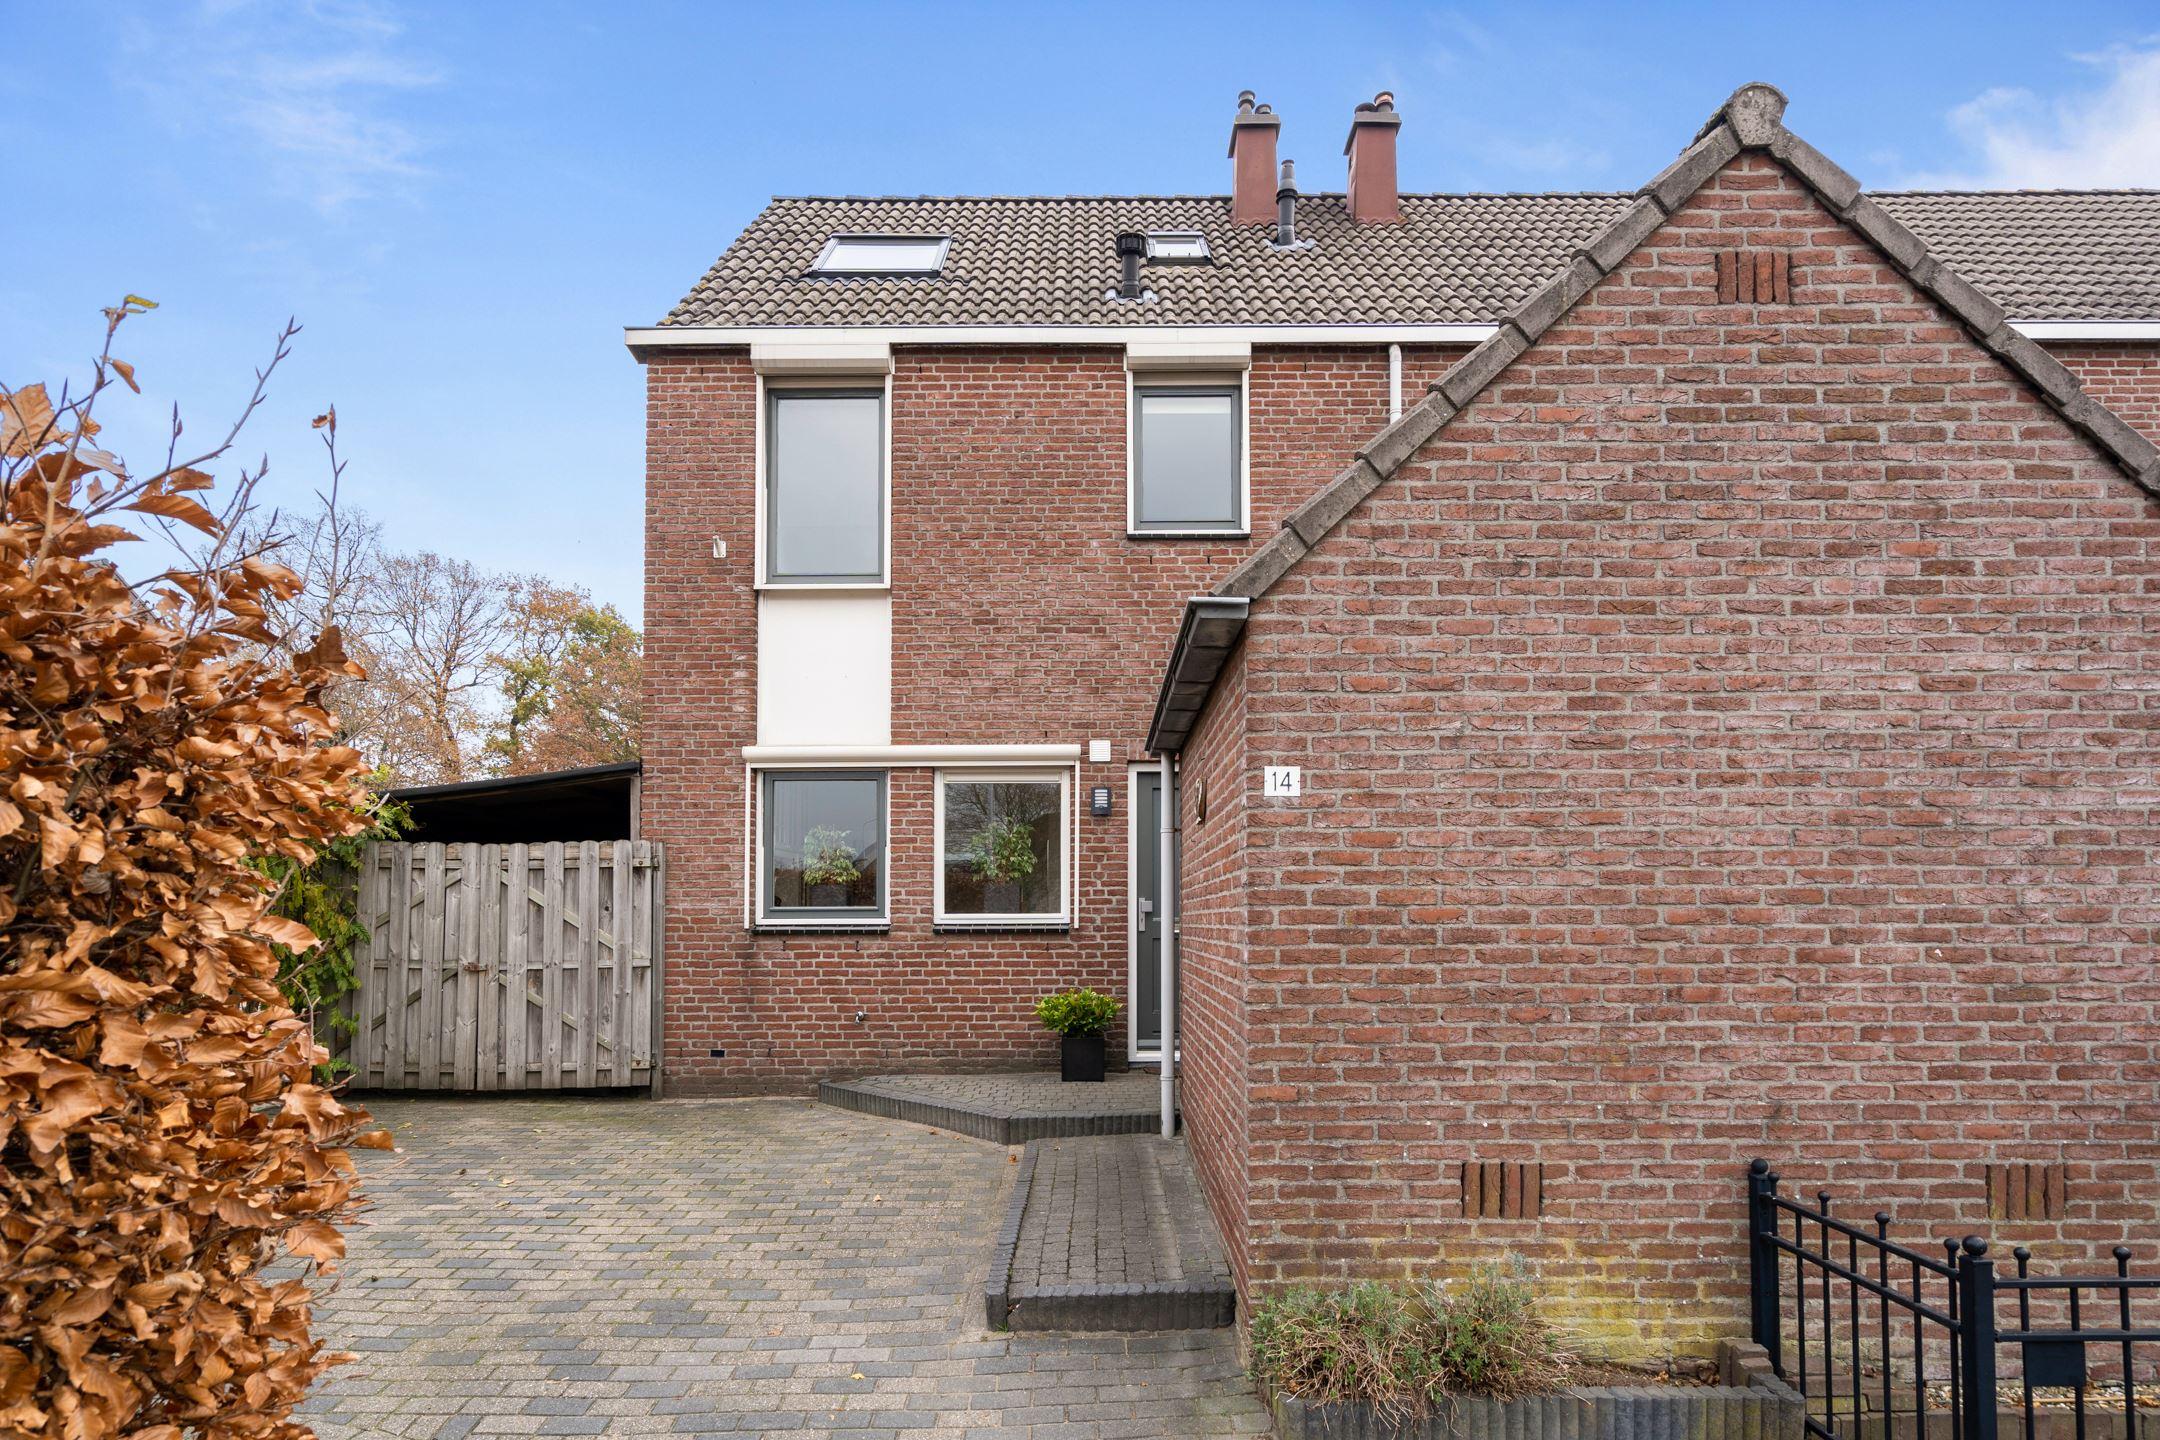 House for sale: hobbemastraat 14 6717 pp ede [funda]